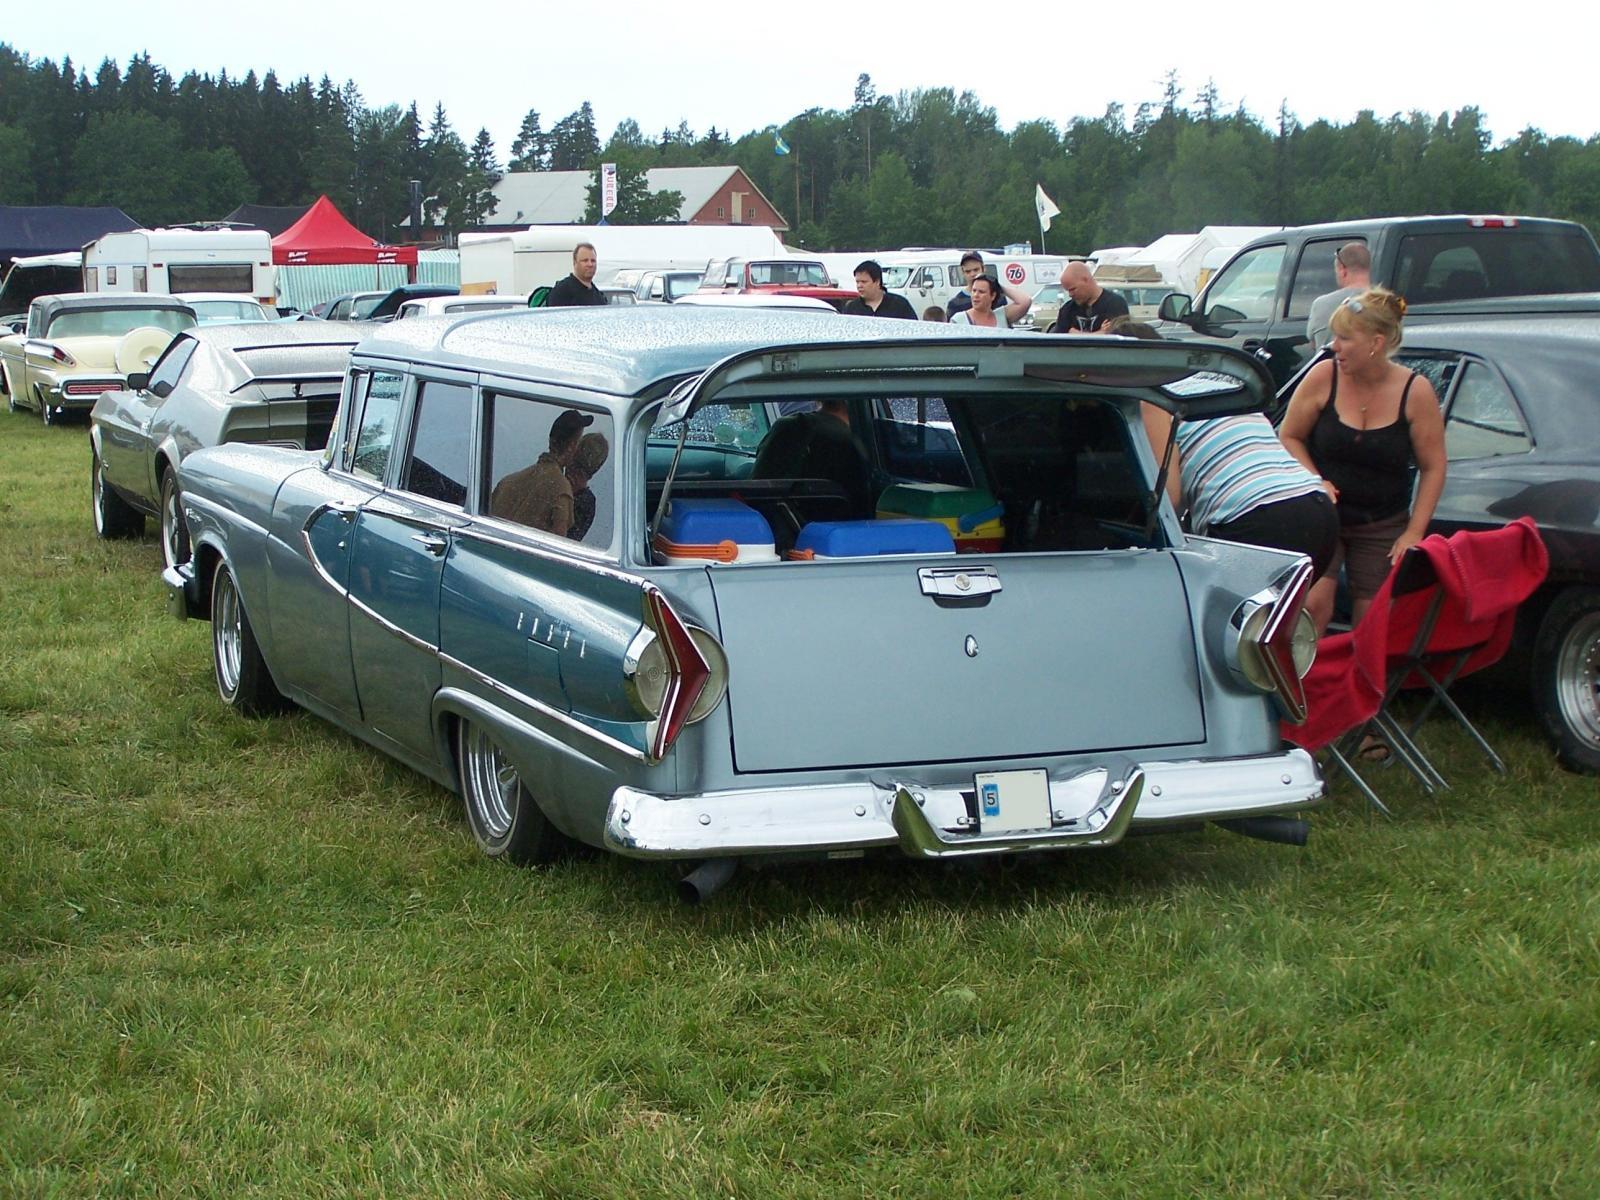 1958_Edsel_Villager_4-dr_wagon.JPG